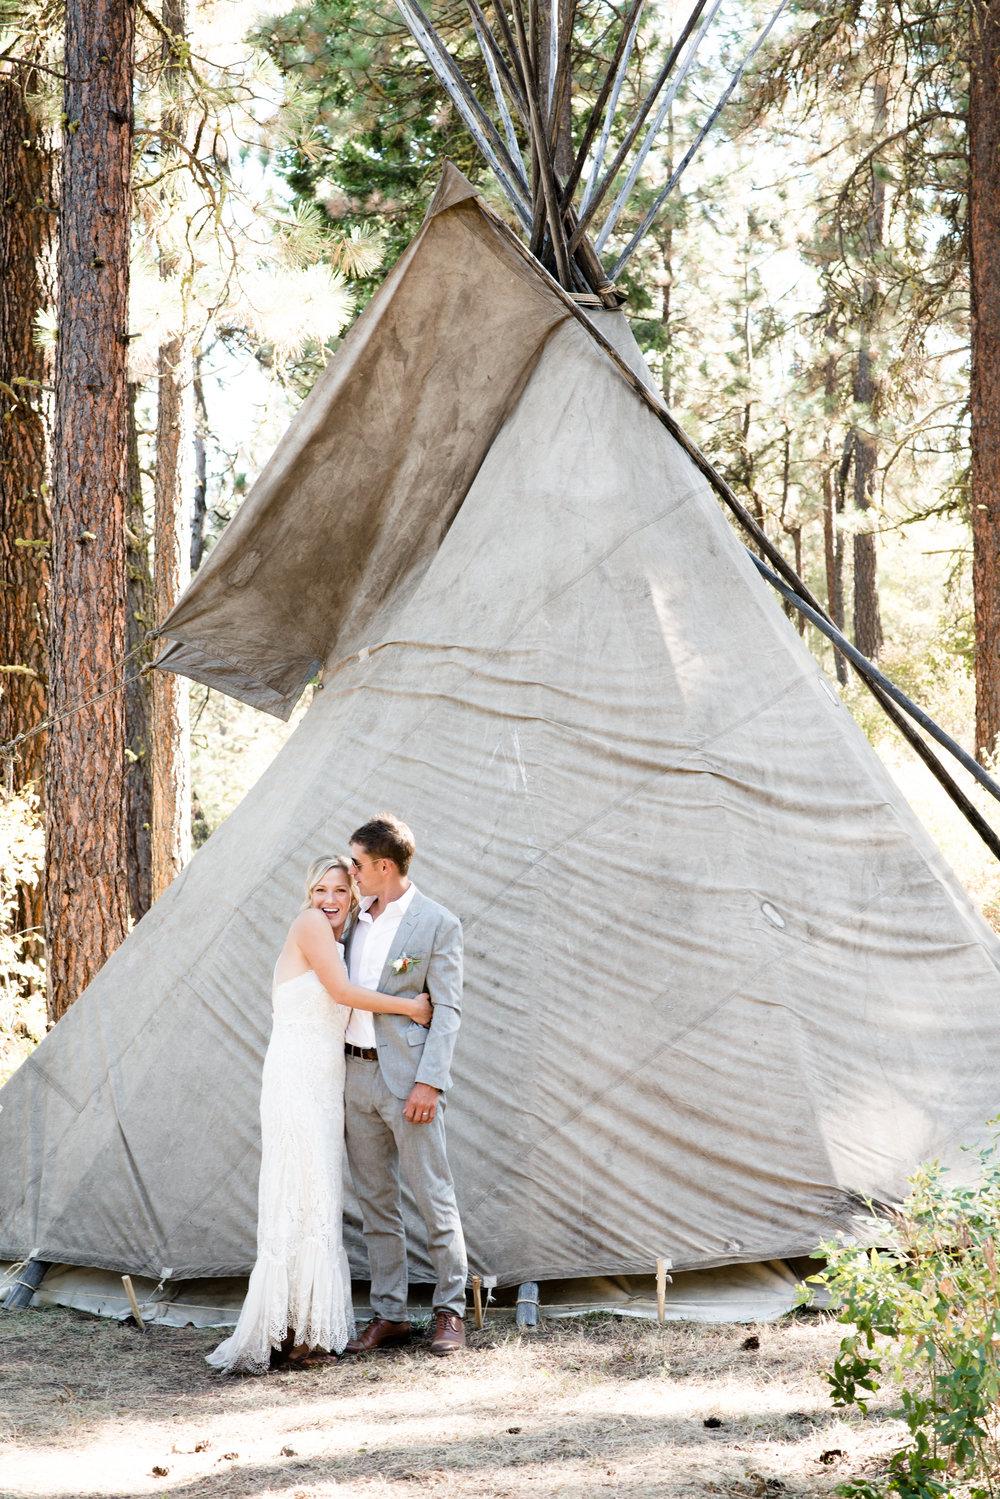 Lana Micah Wedding La Grande Oregon September 2018 Please Credit Talia Jean Galvin (280 of 687).jpg